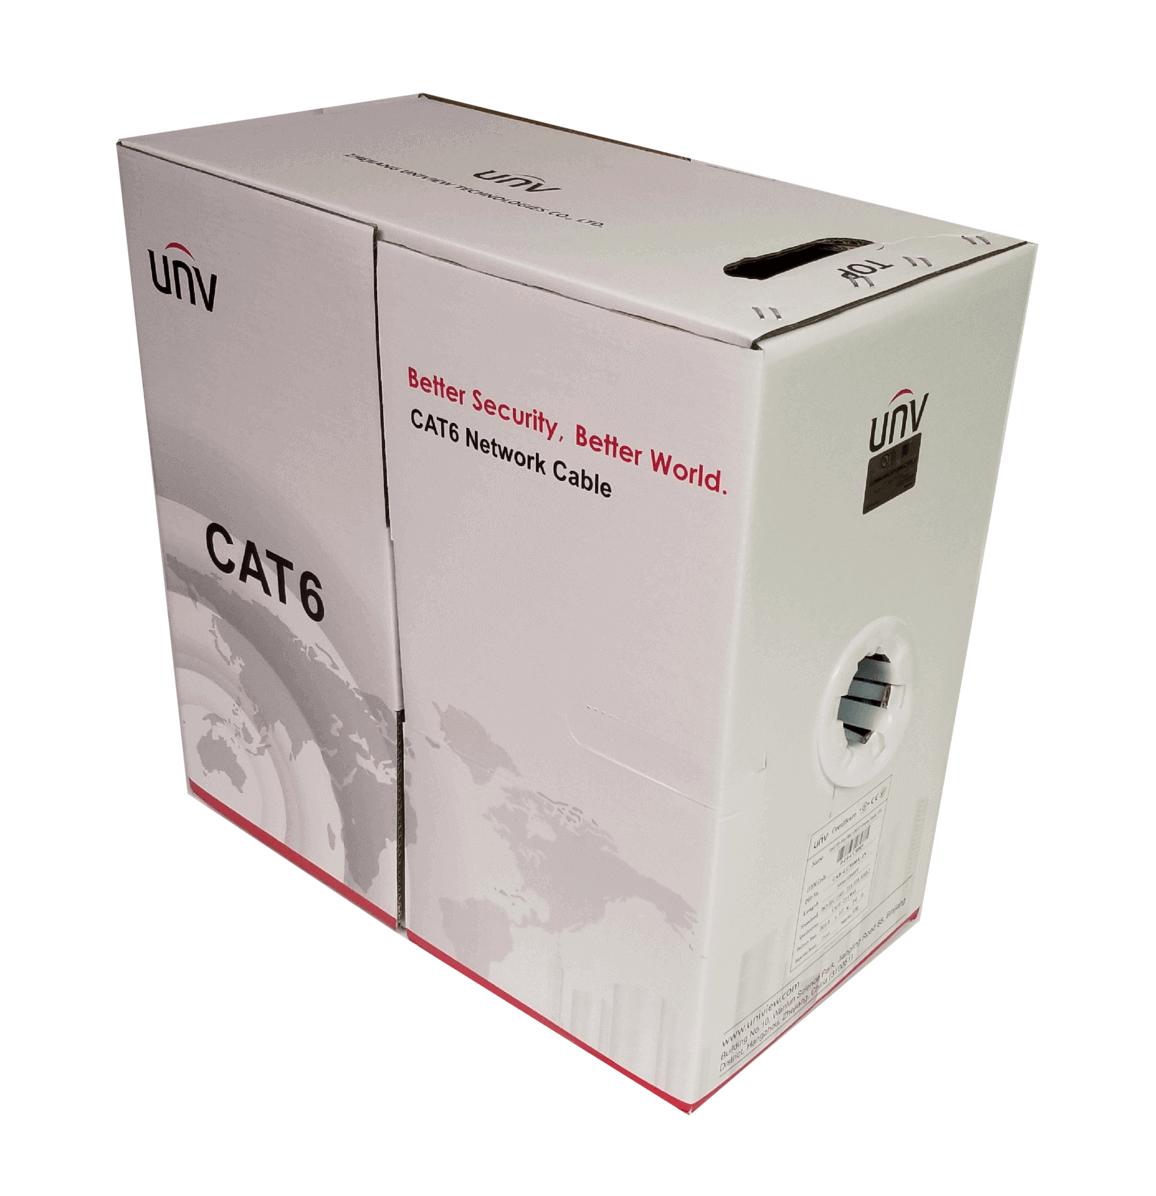 Dây mạng Cat6 UNV CAB-LC3100B-E-IN